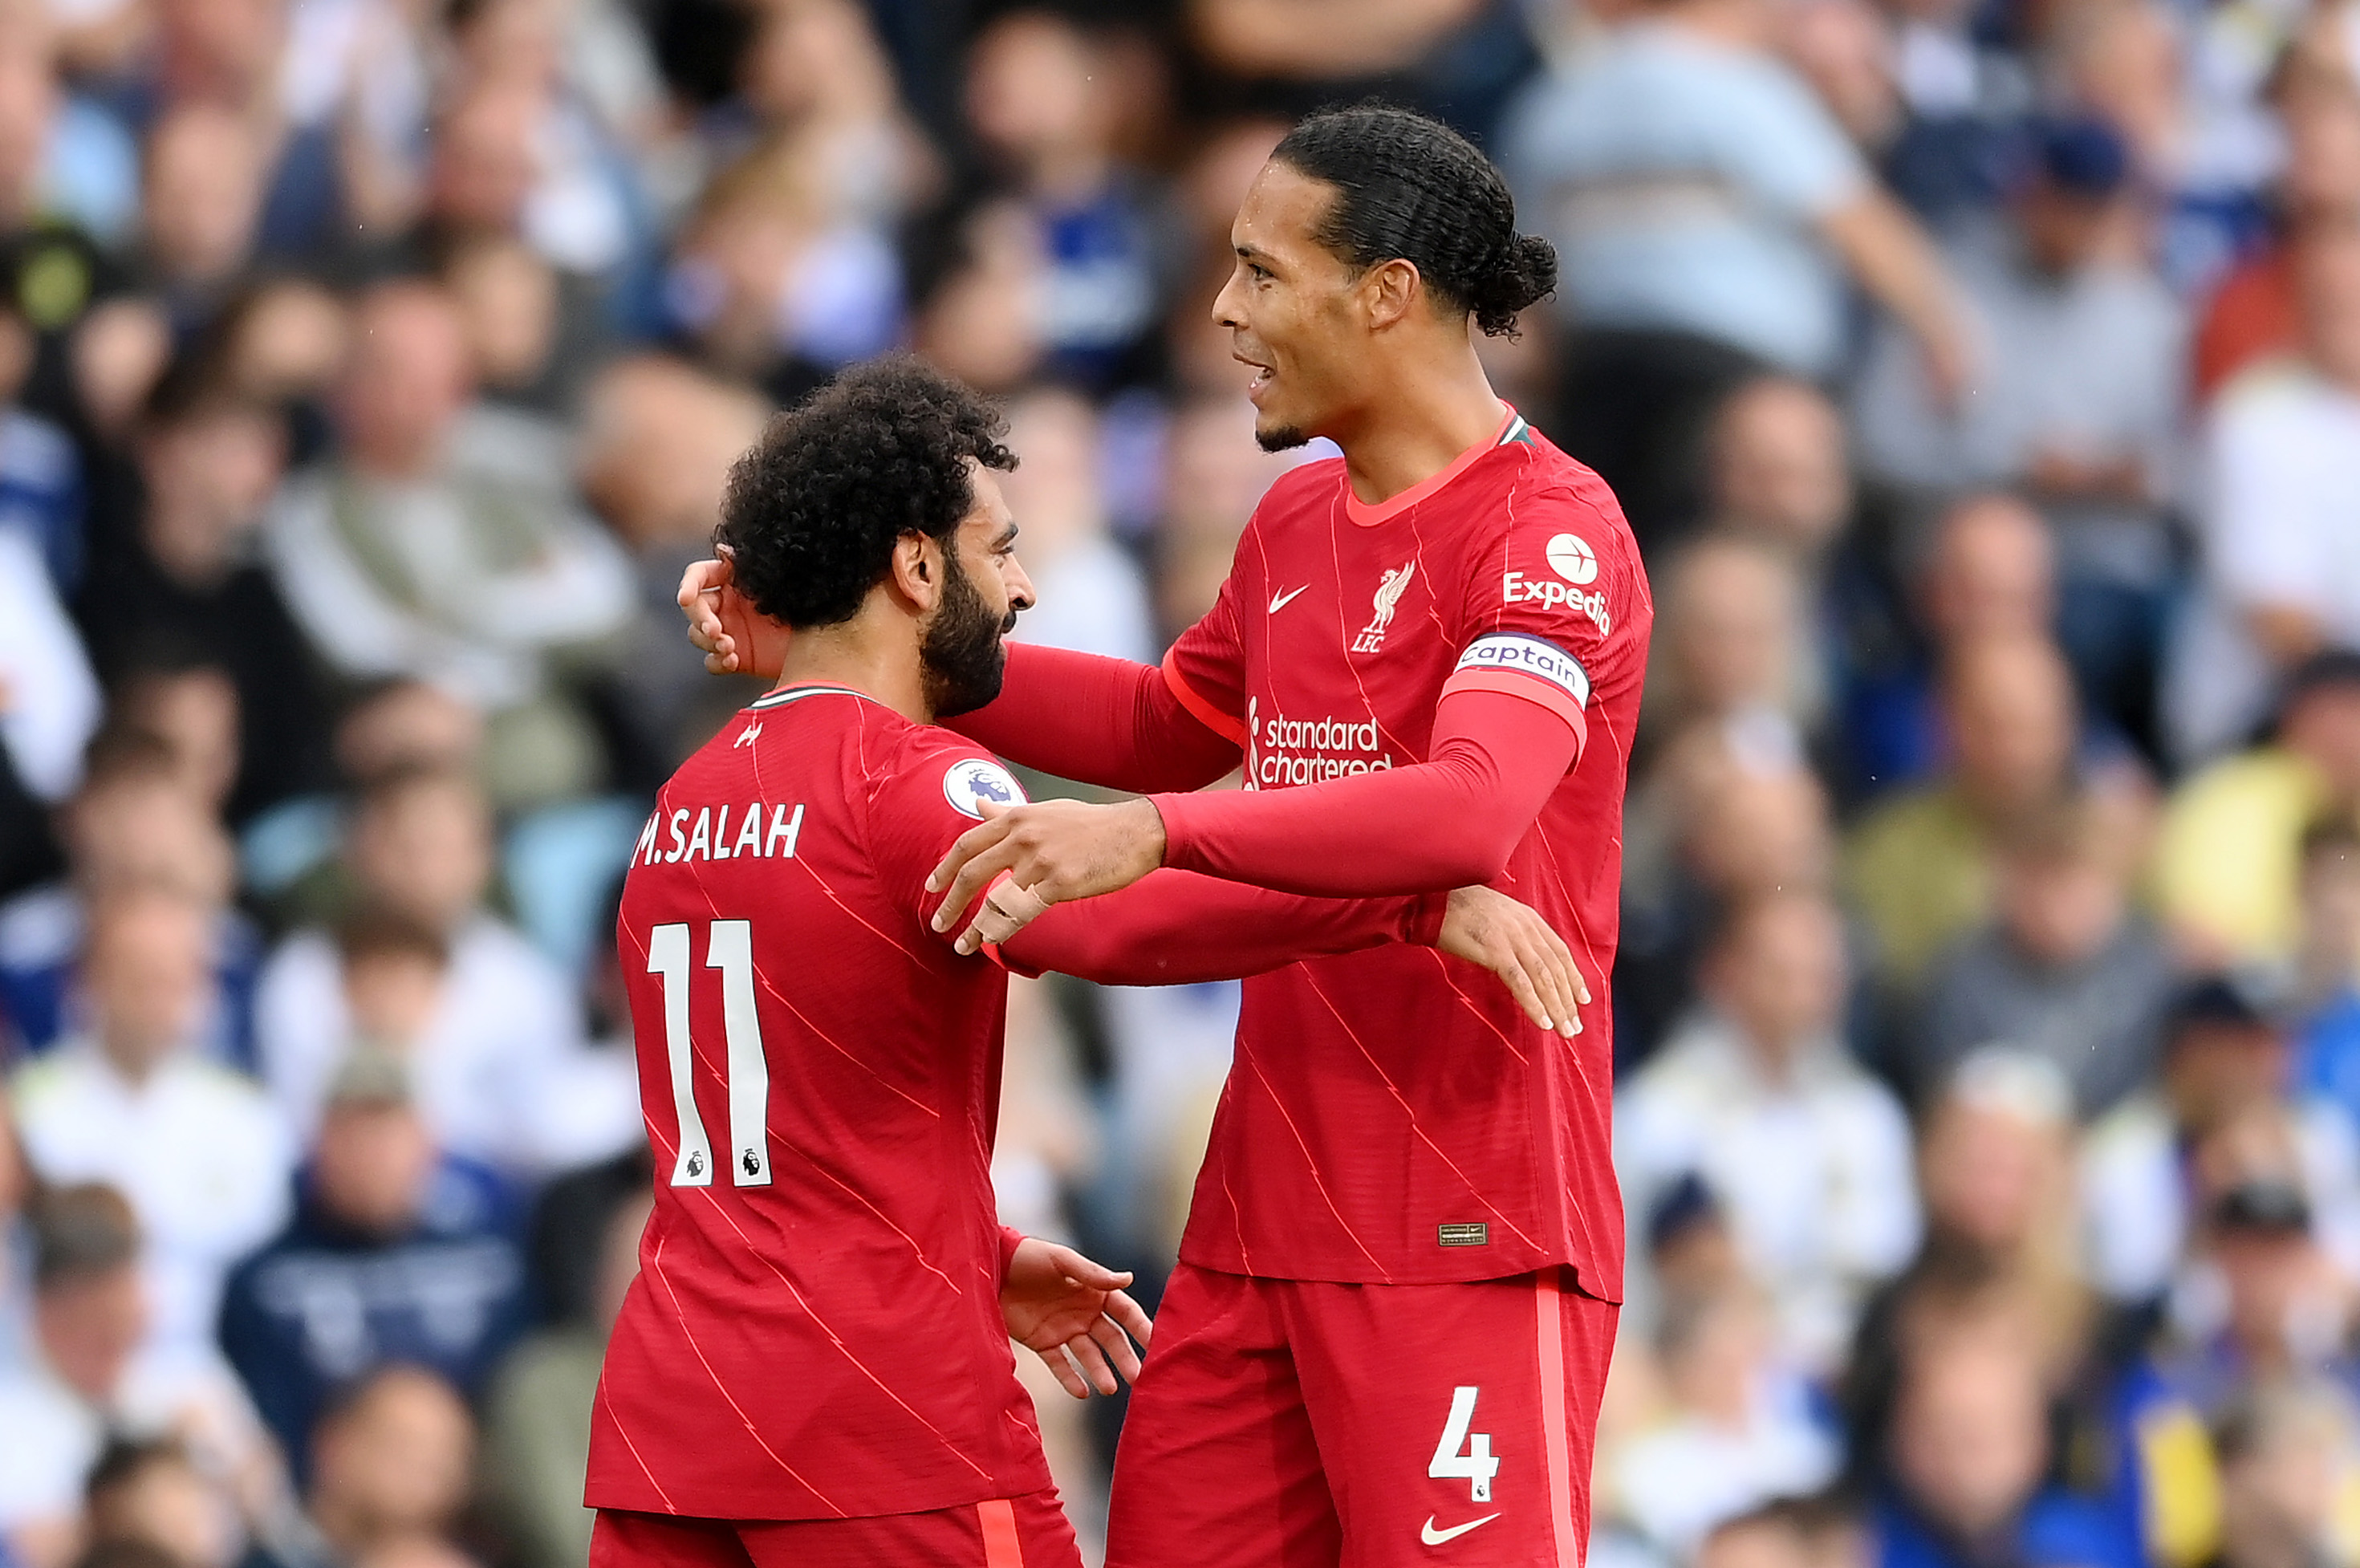 Mohamed Salah celebrates with Virgil van Dijk - Liverpool - Champions League